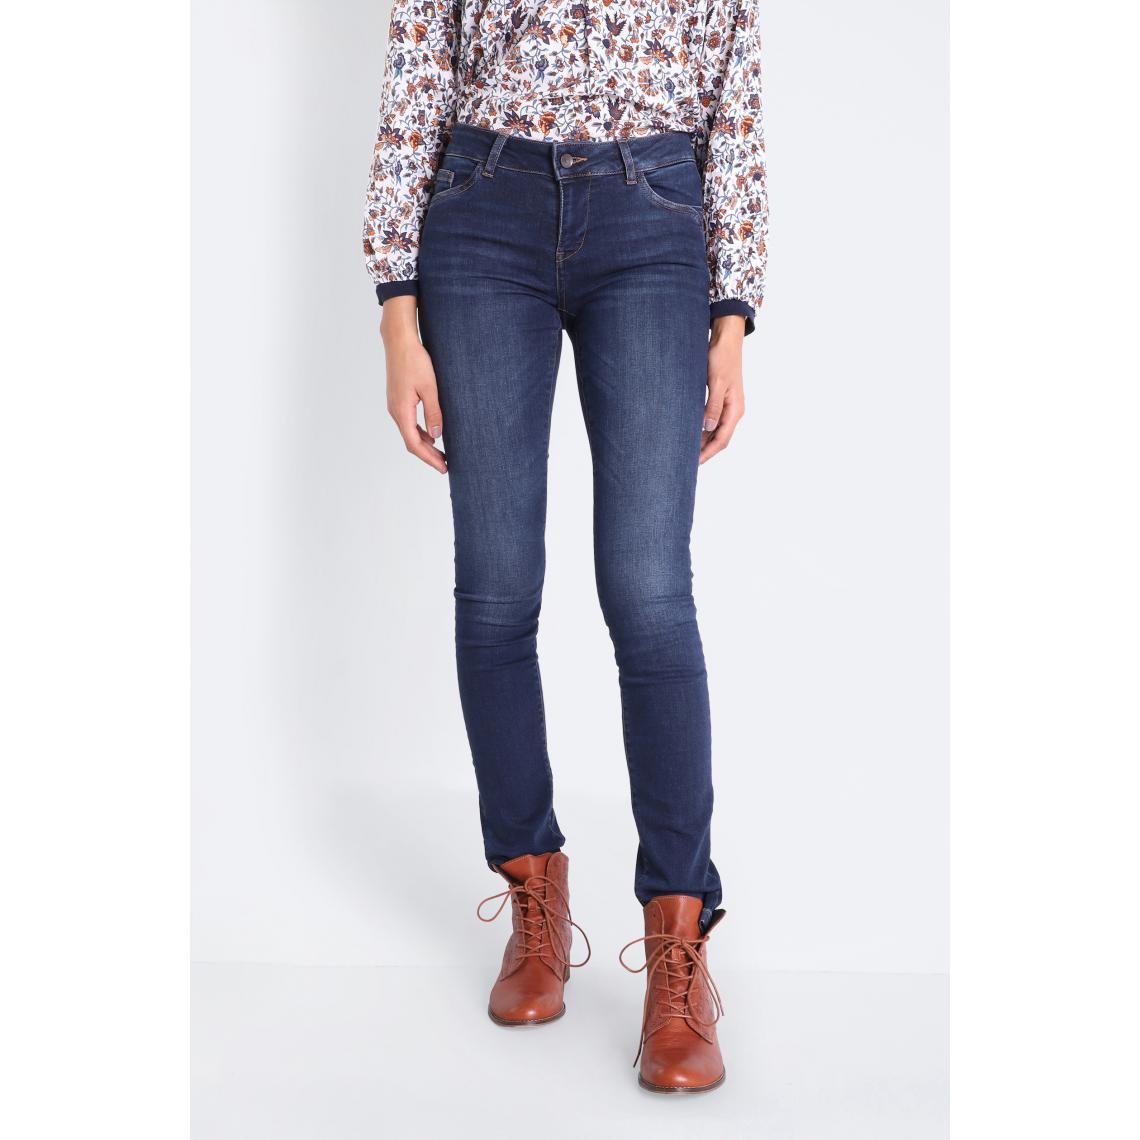 Jeans femme slim - Bonobo - Modalova